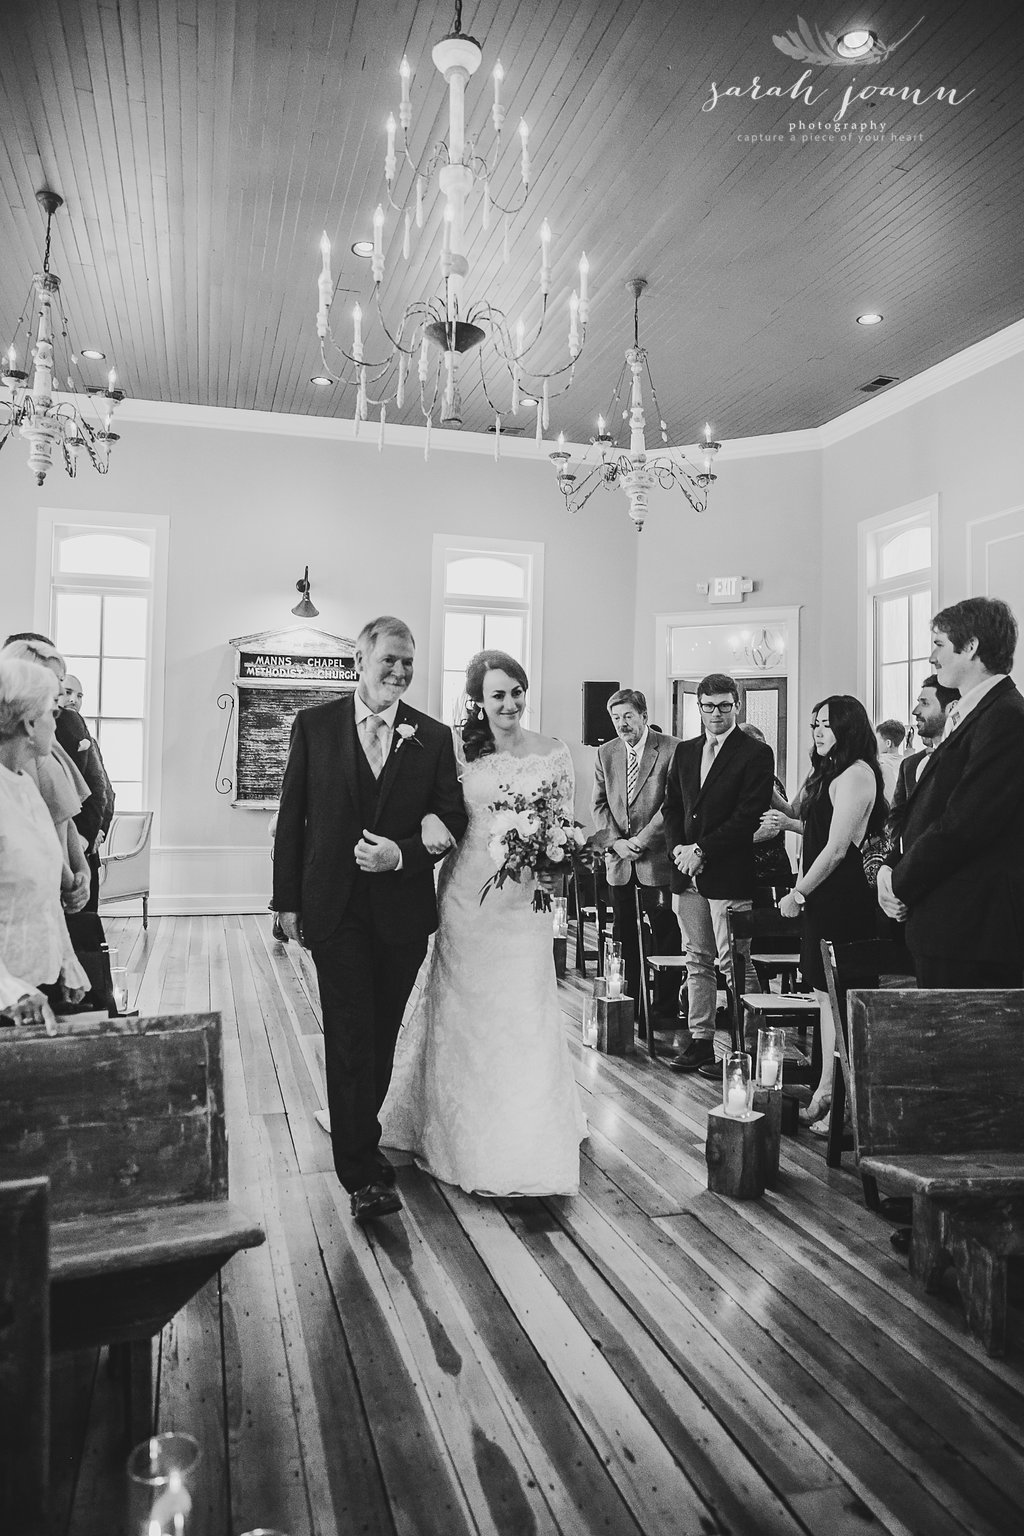 the-Parlour-wedding-photographer-B&B-IMG_61591051.jpg